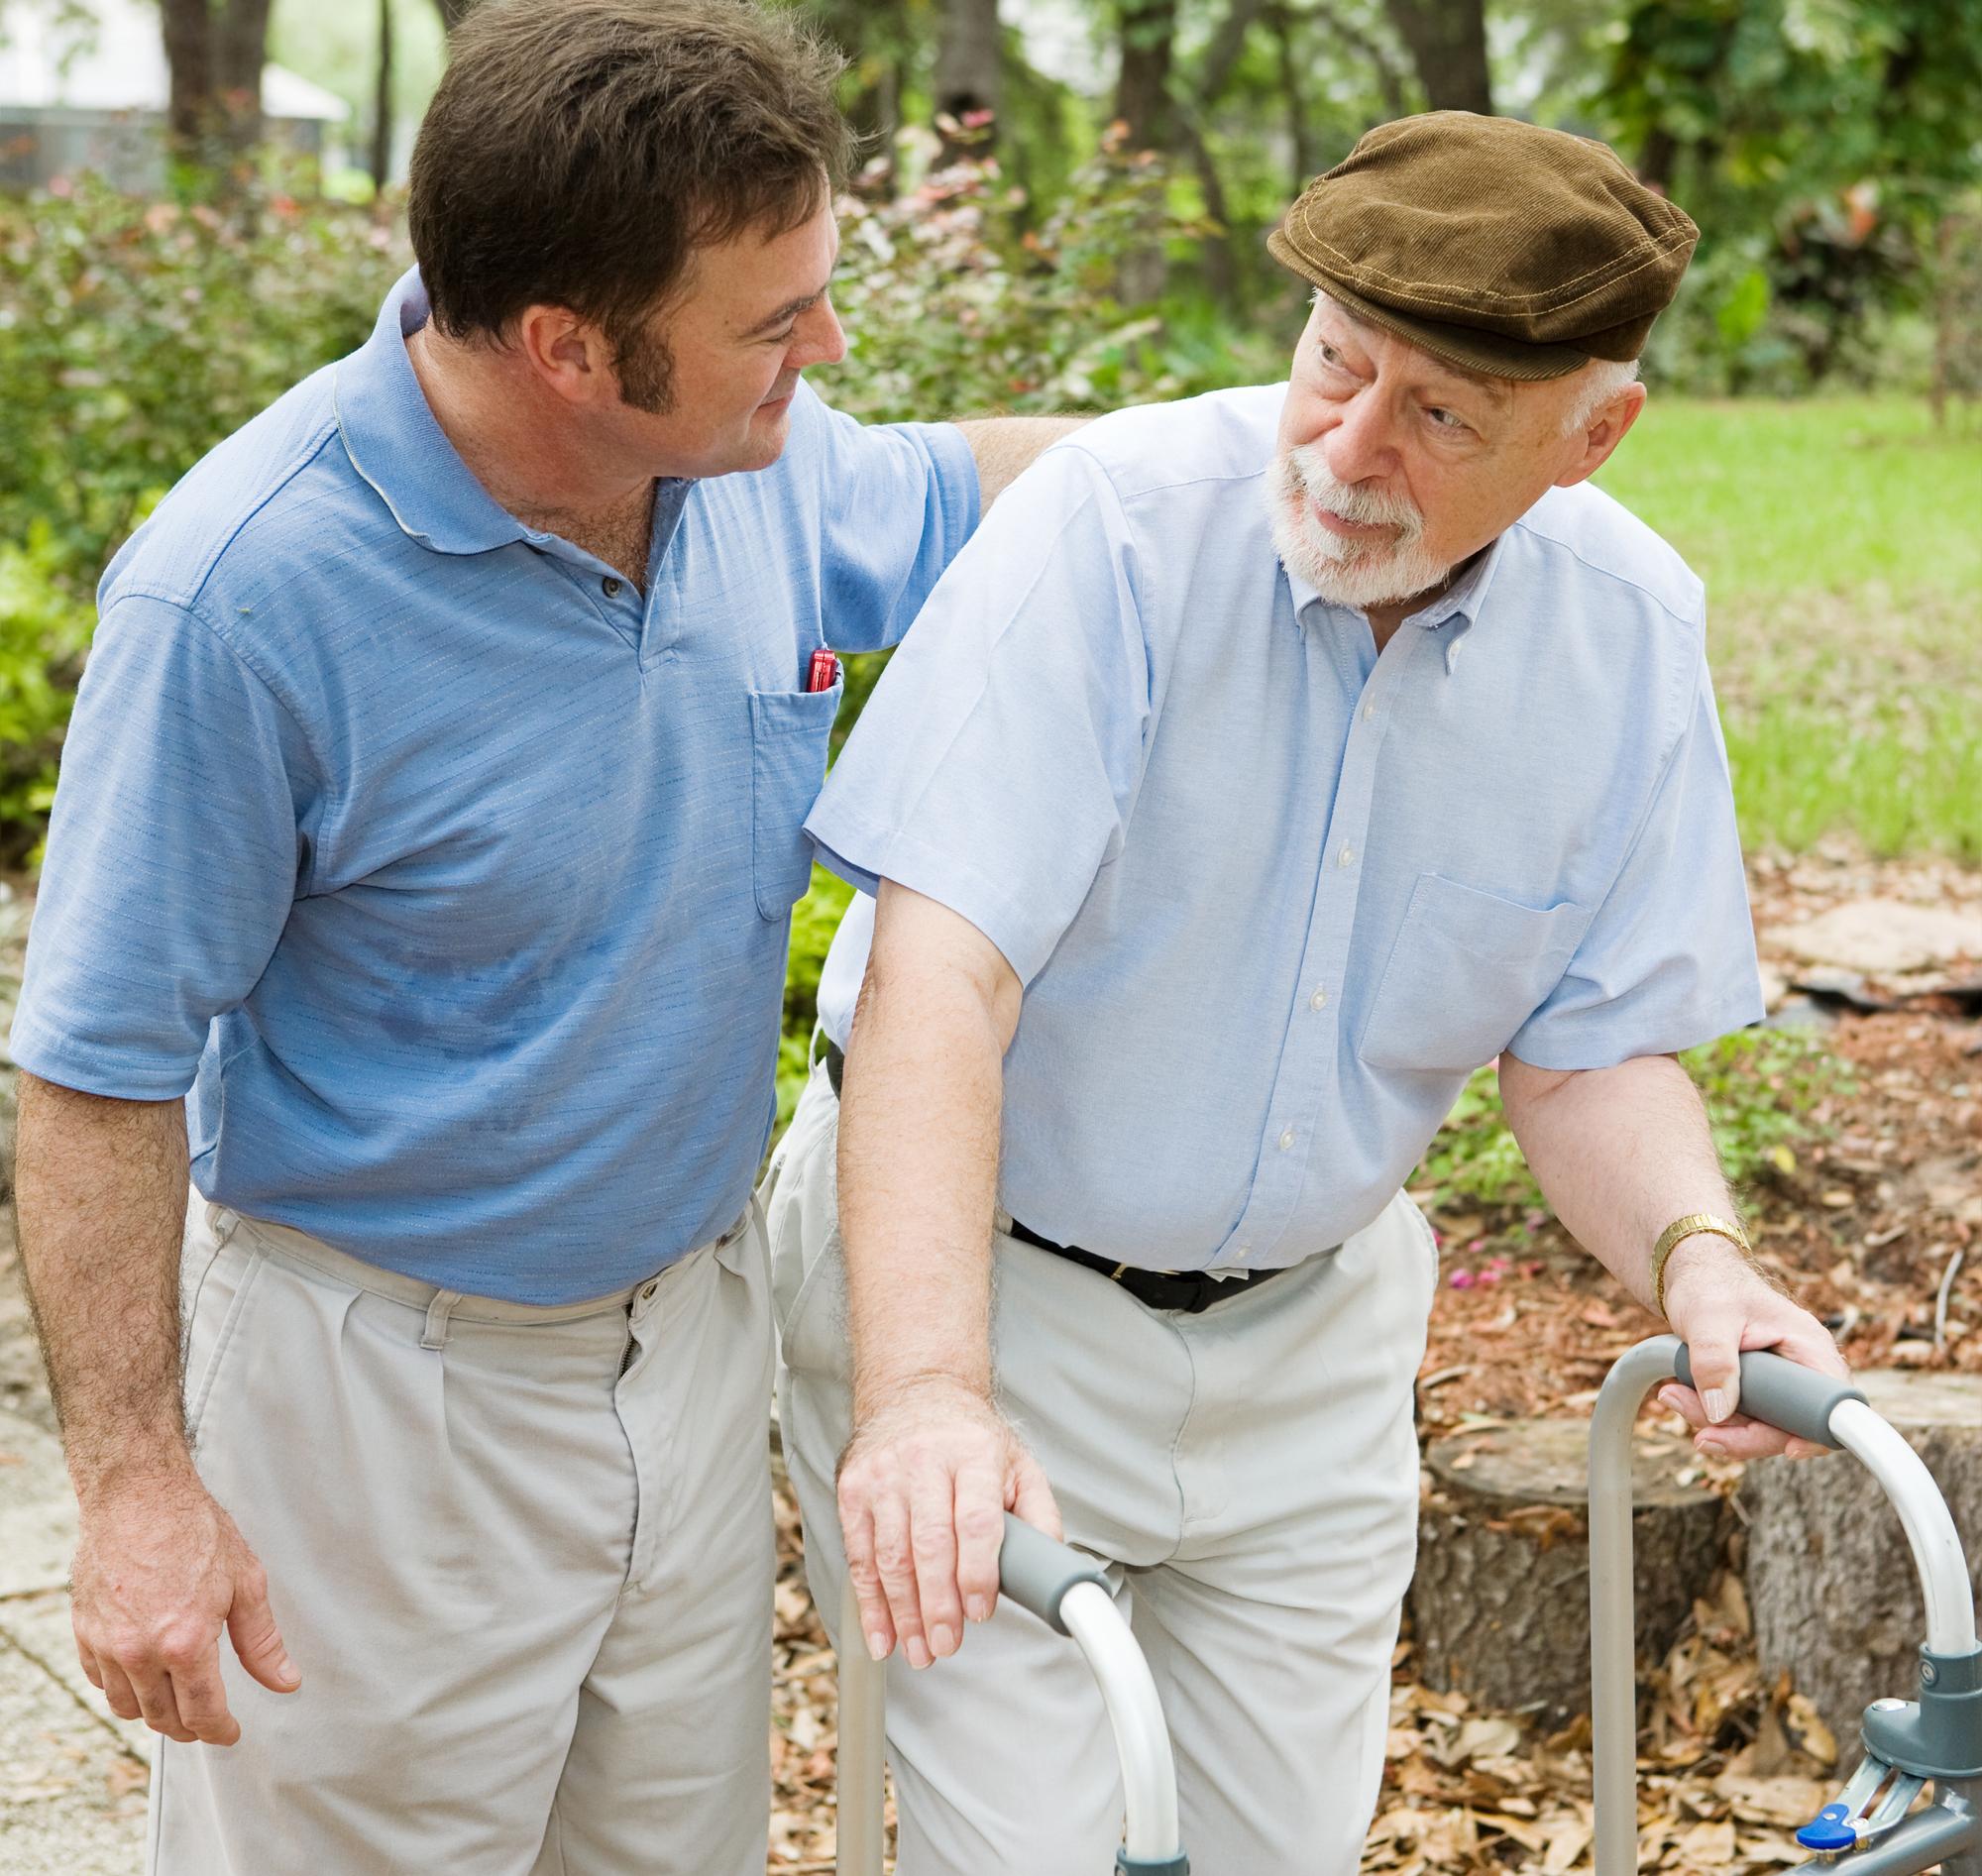 senior-care-Jacksonville-AL